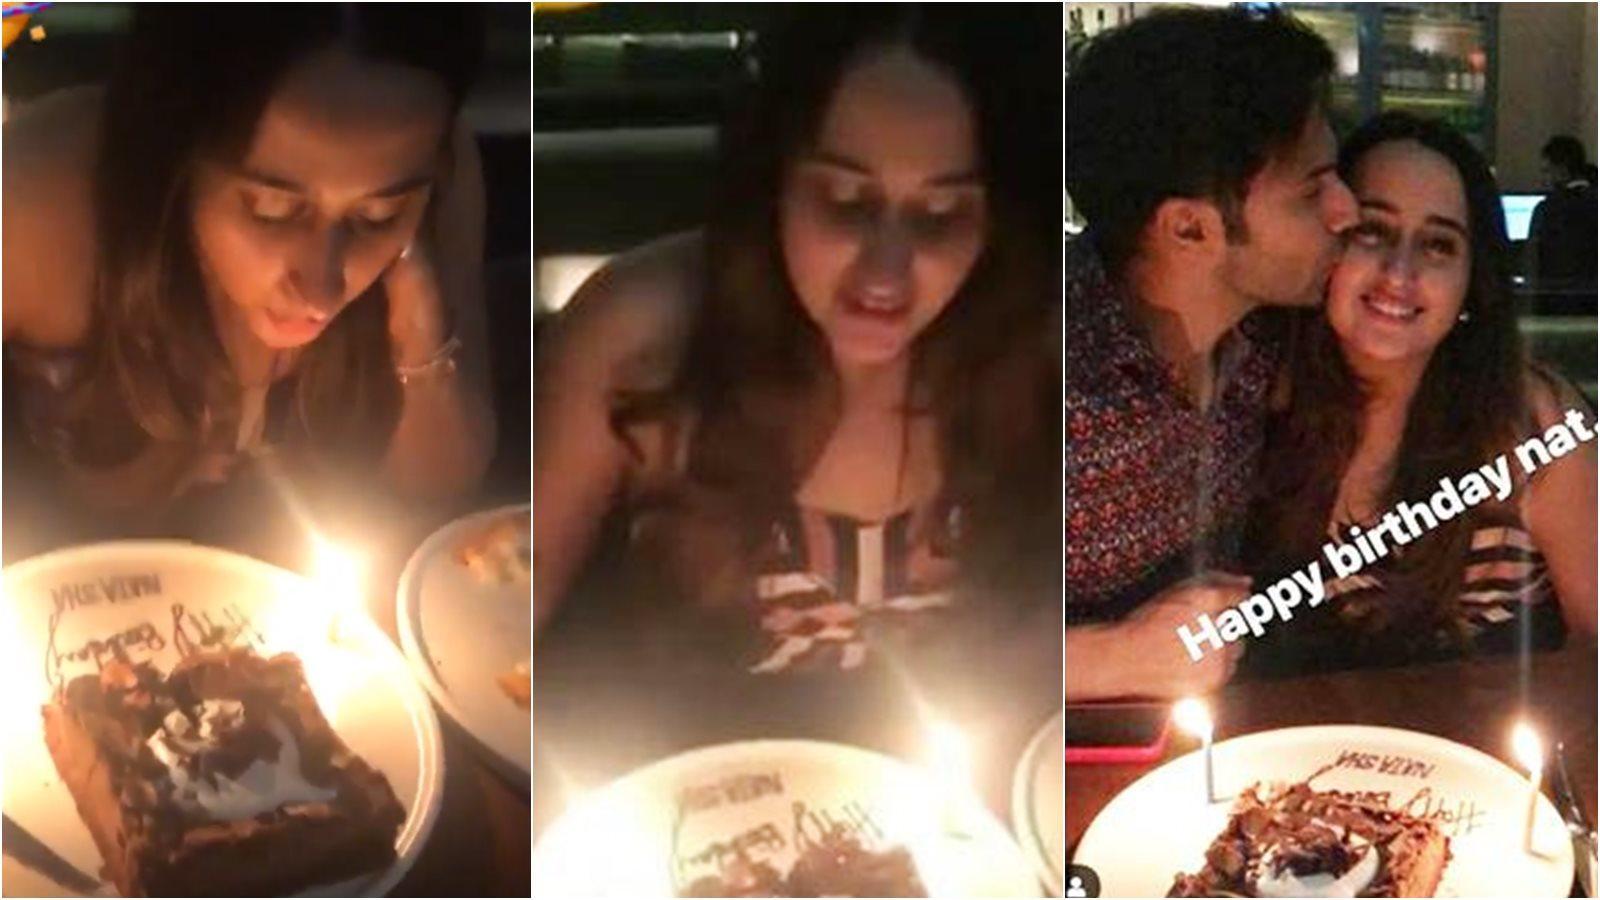 Varun Dhawan celebrates girlfriend Natasha Dalal's birthday, shares adorable video